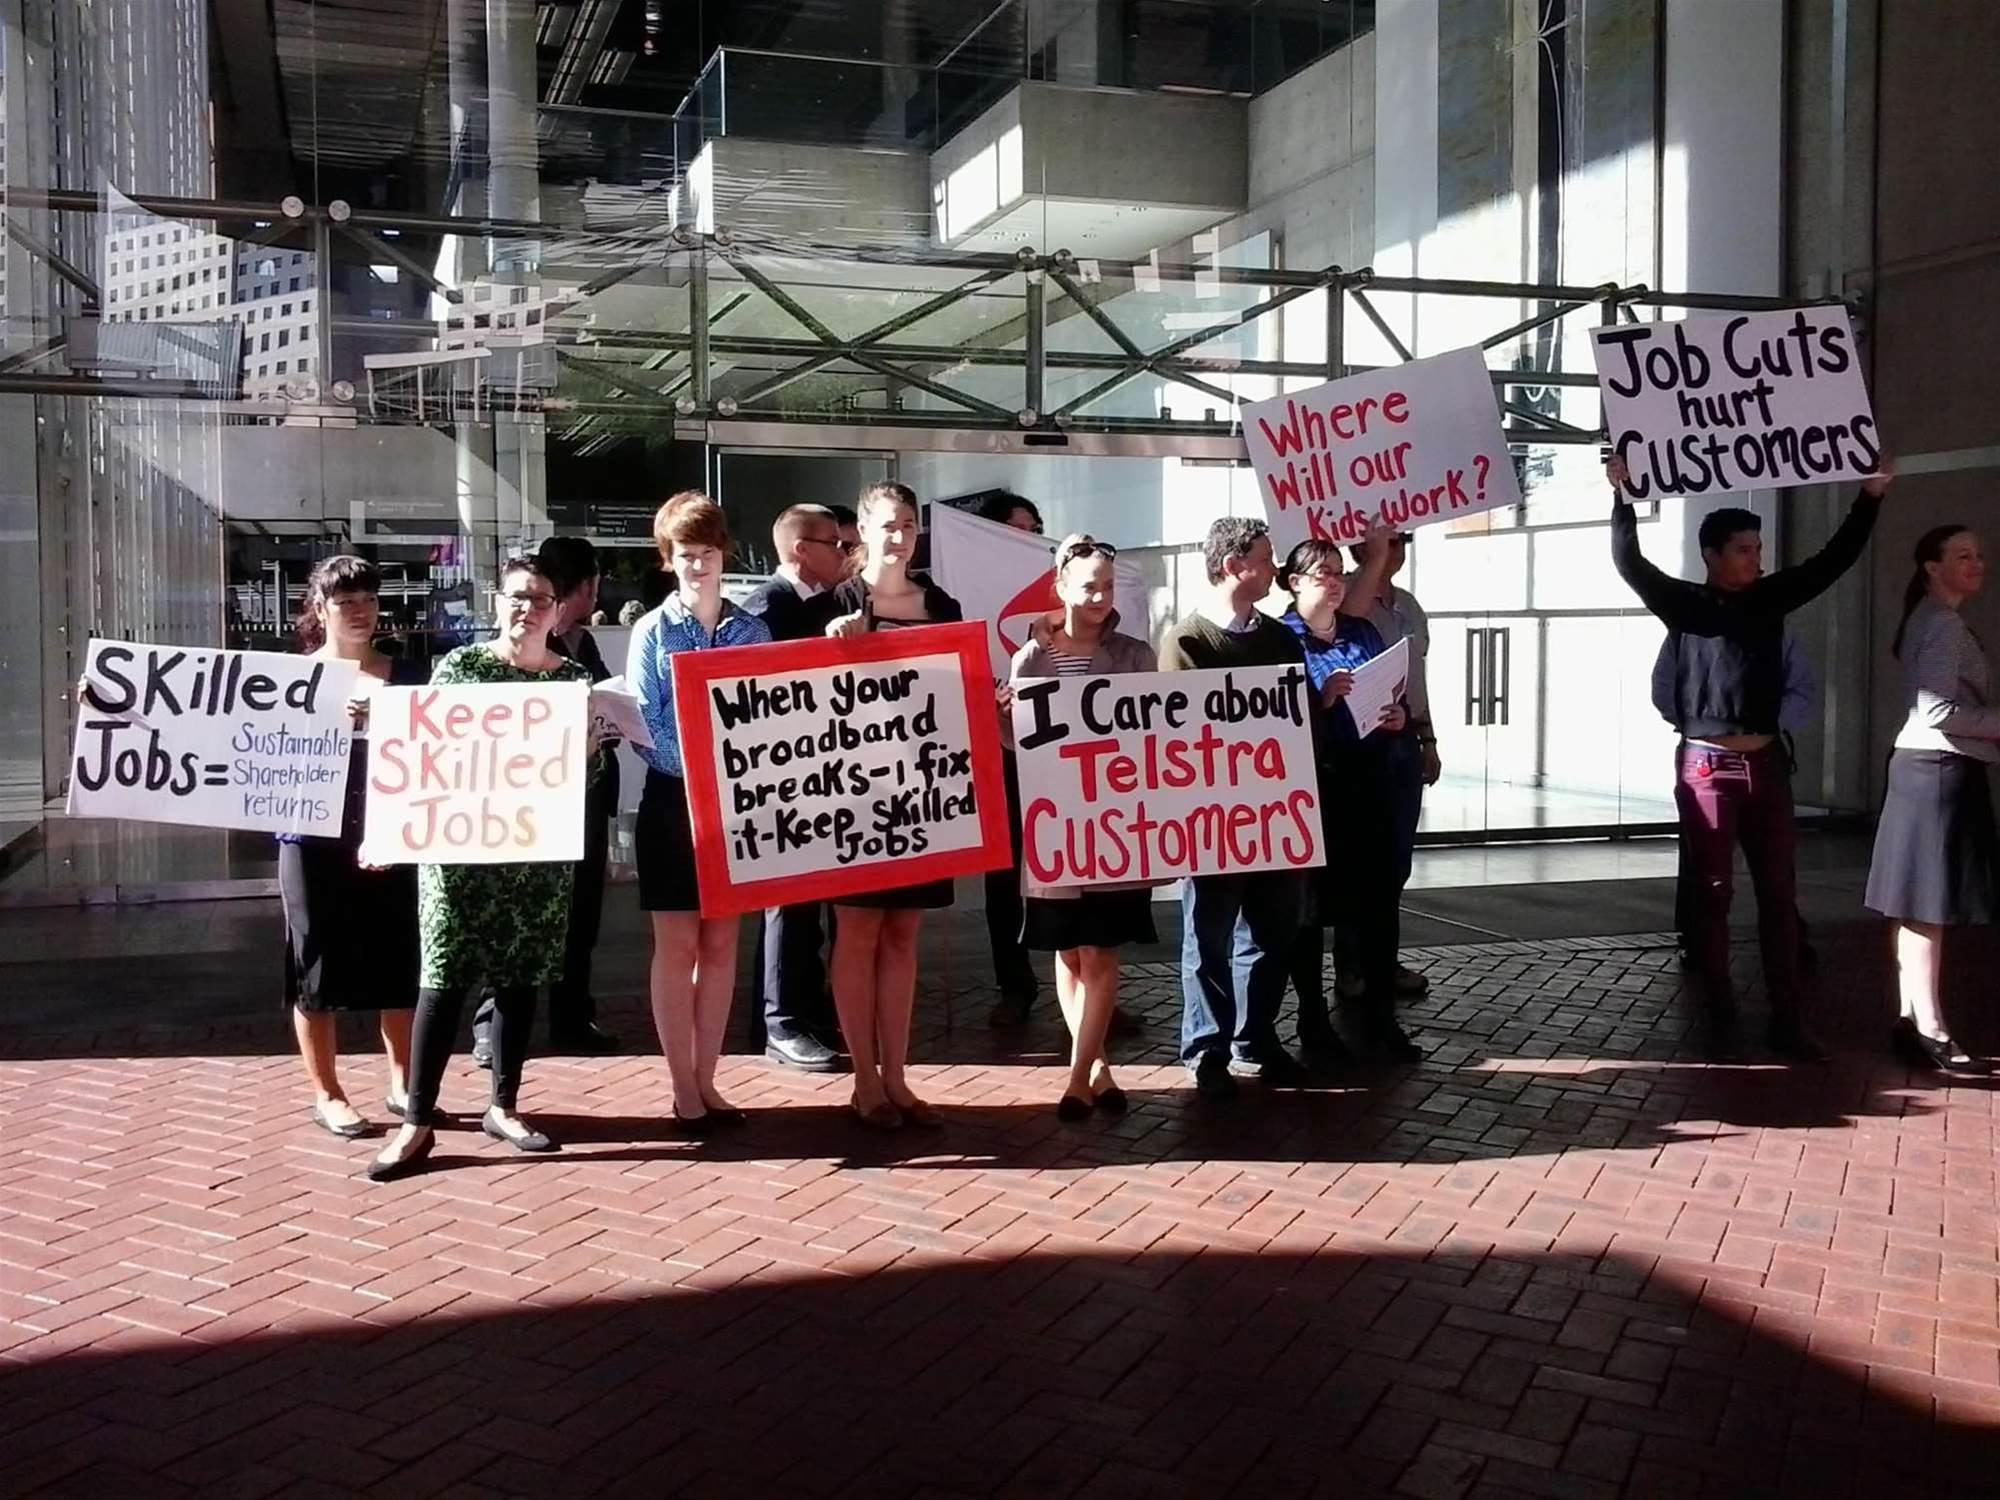 Photos: Union protests Telstra job cuts